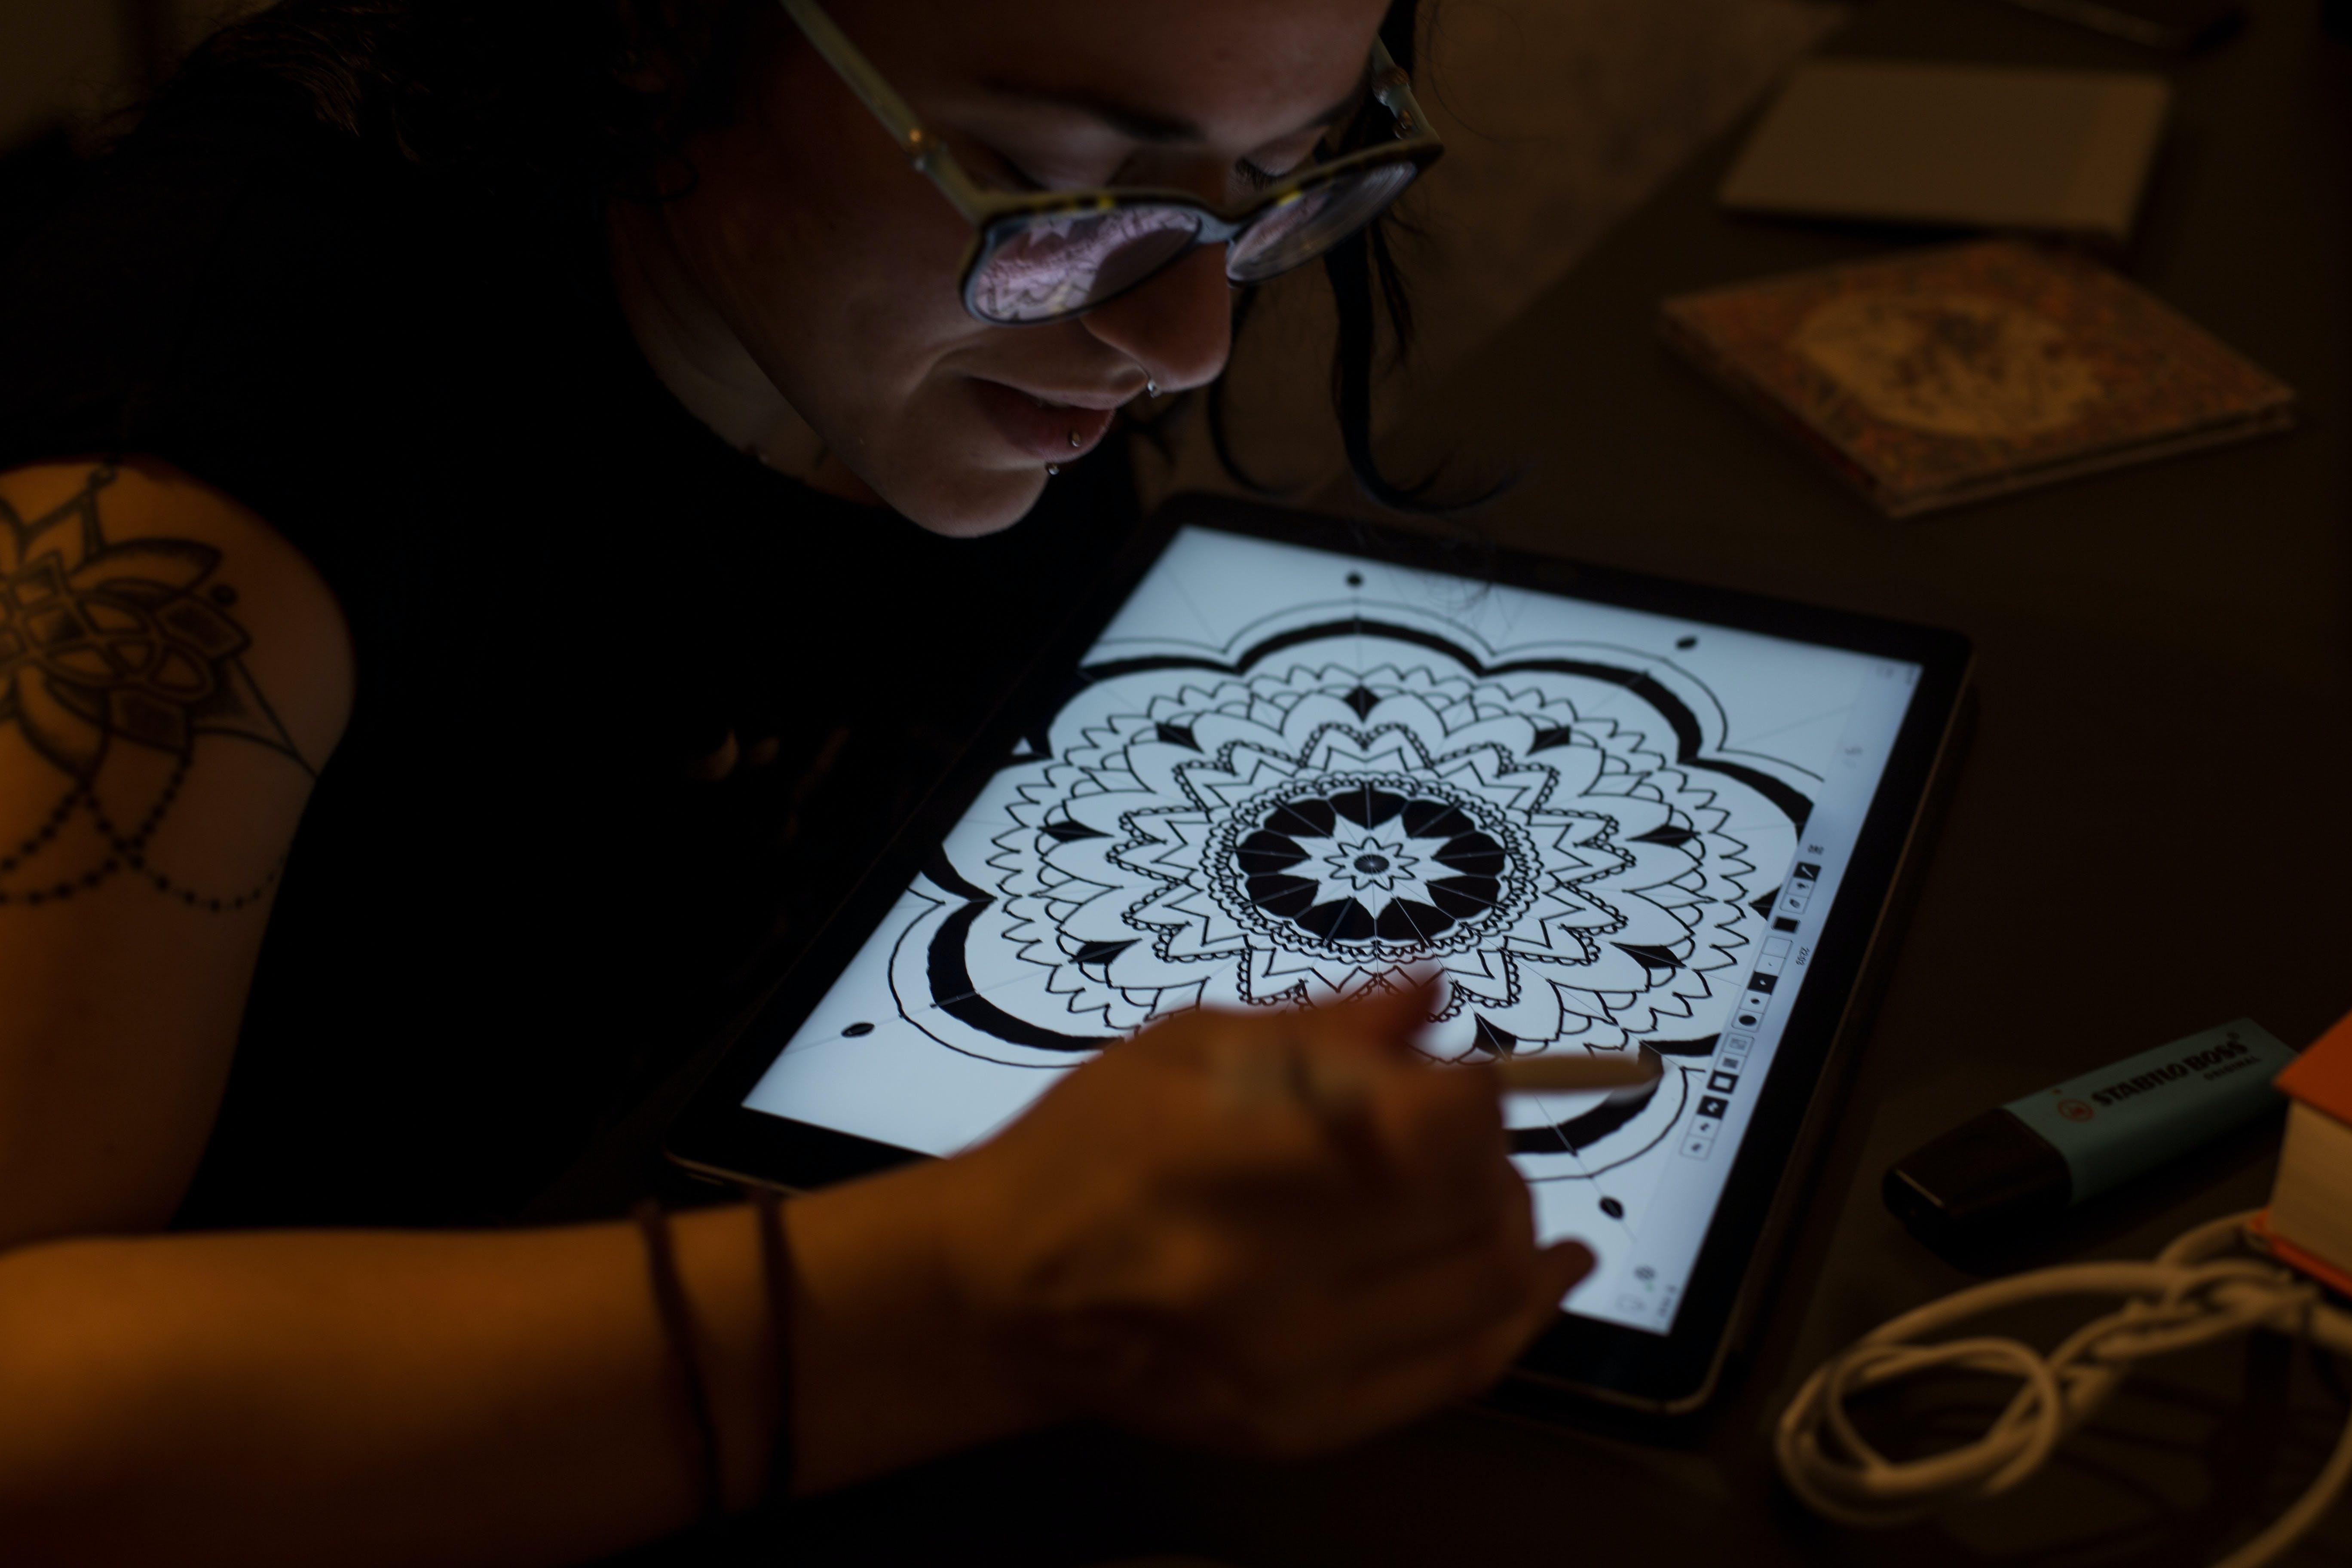 Woman Draws Mandala in Tablet Computer